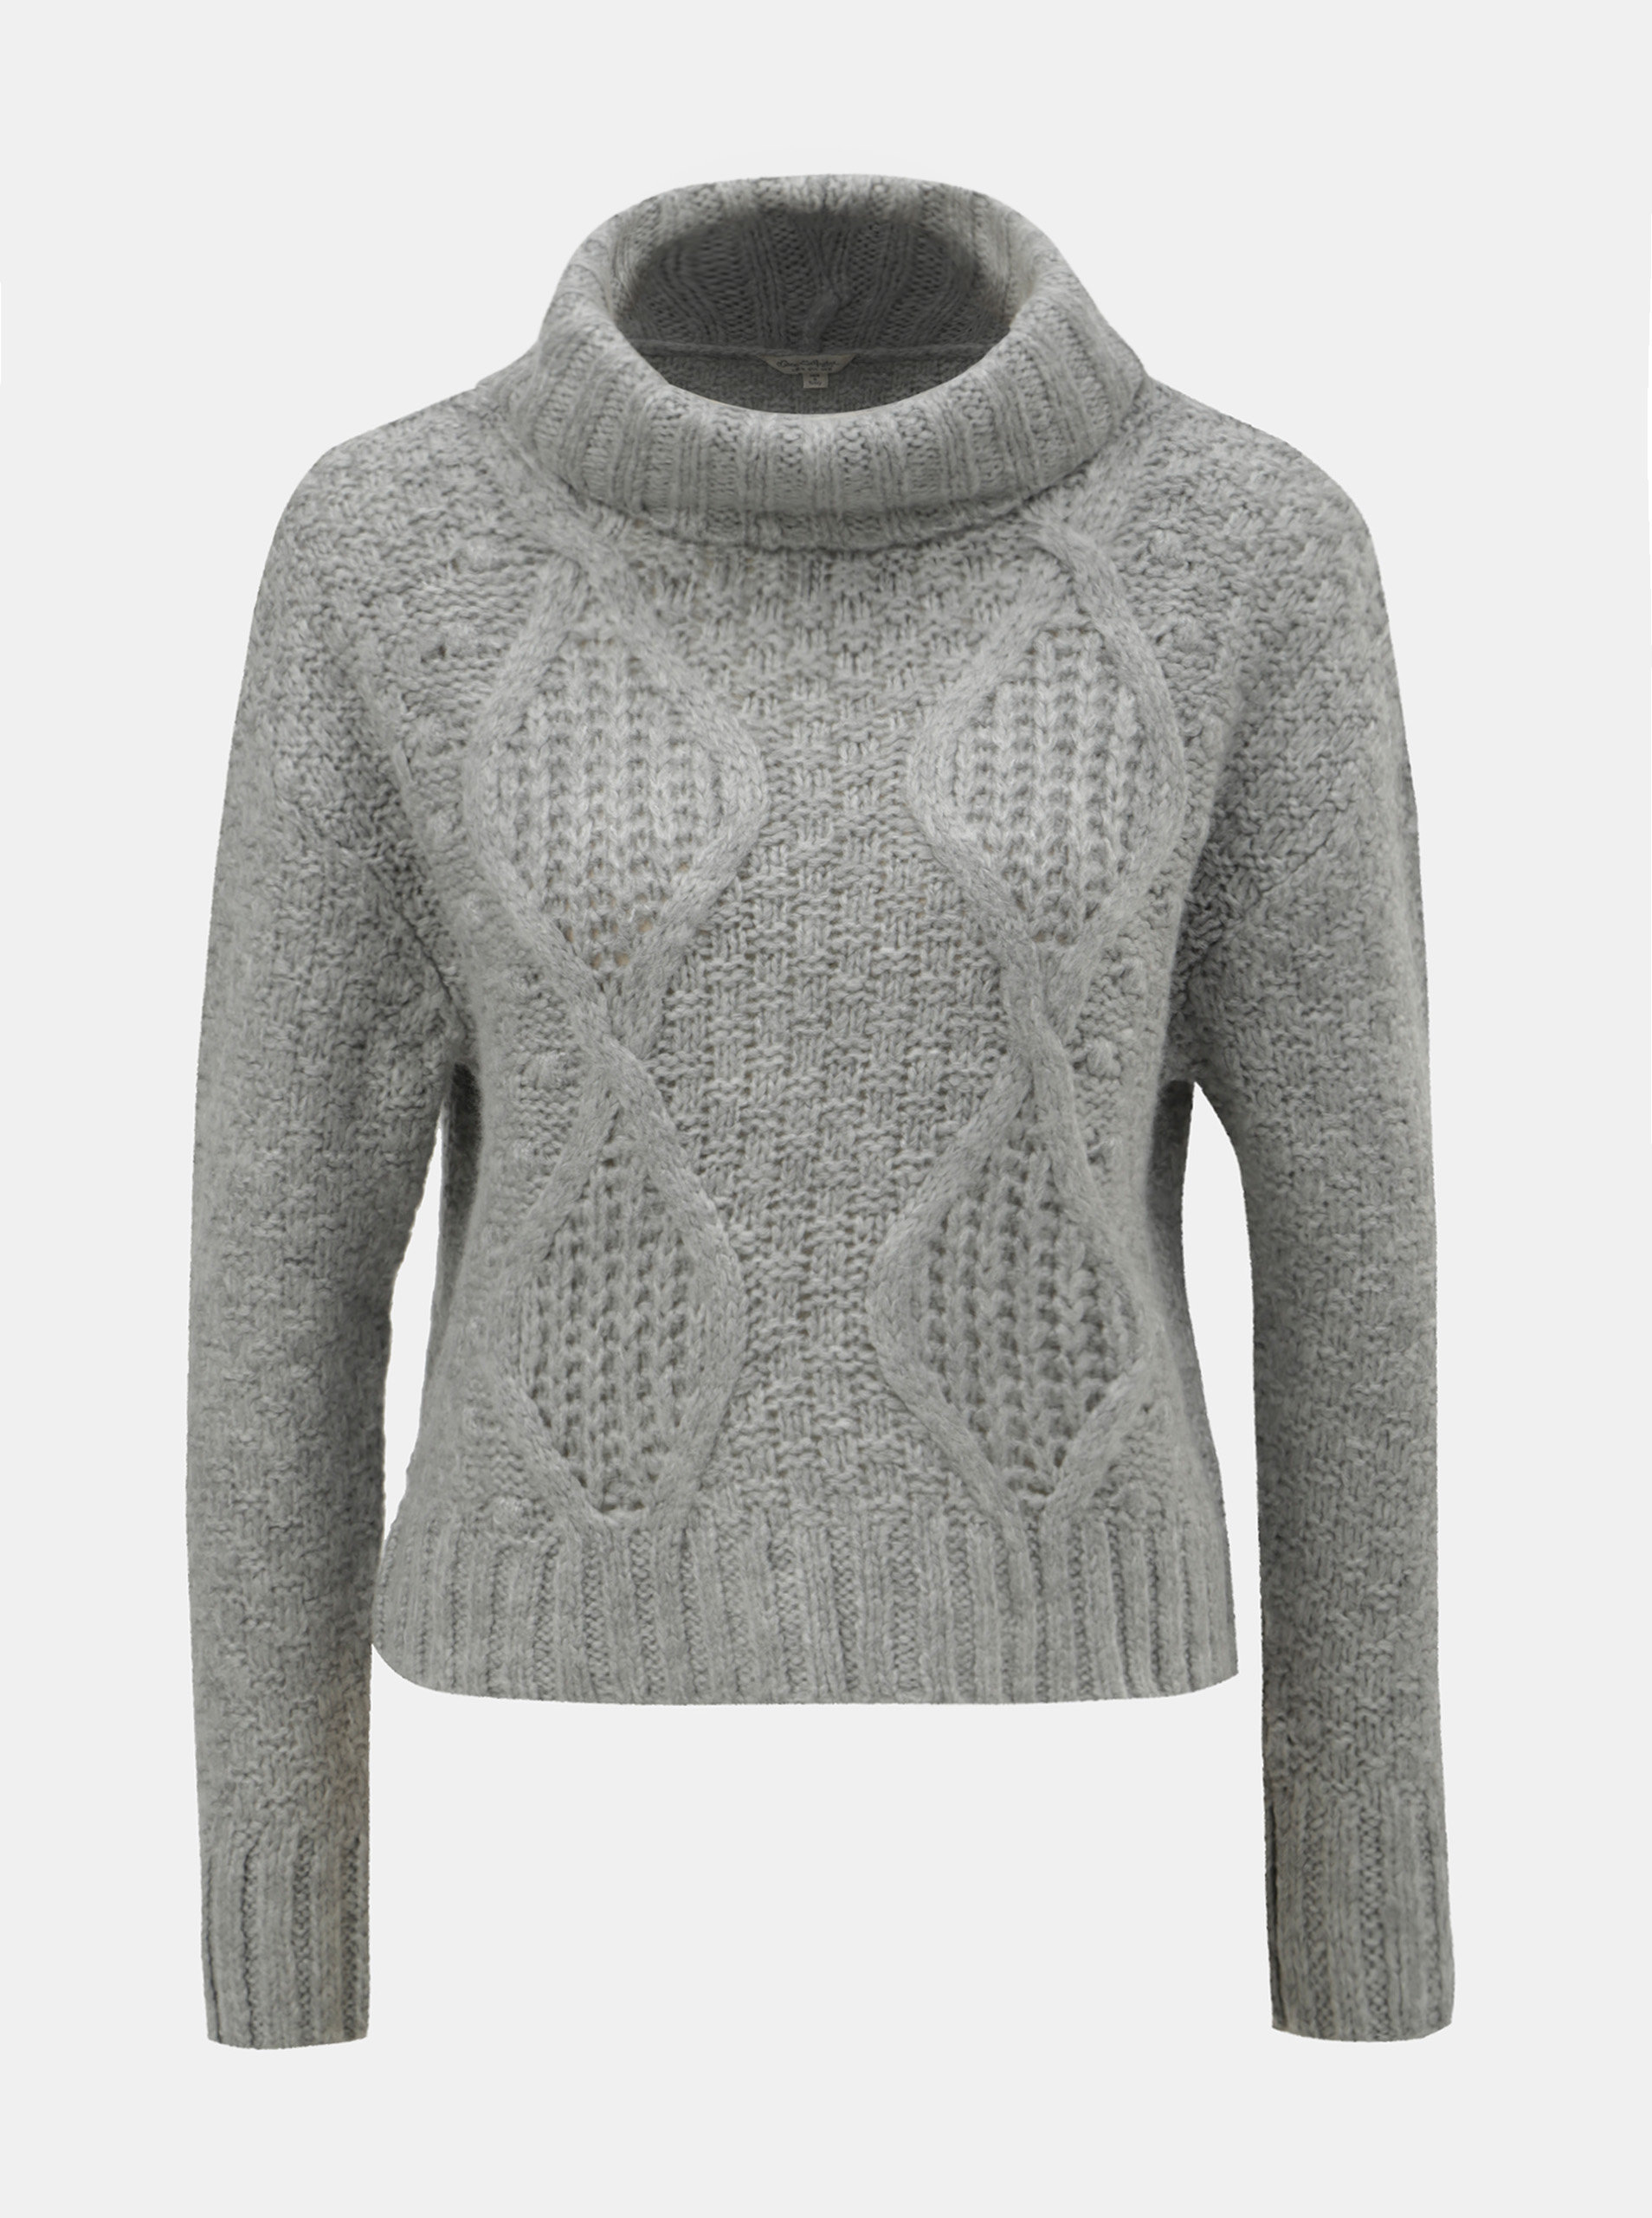 Šedý krátký svetr s rolákem Miss Selfridge ... e089387369